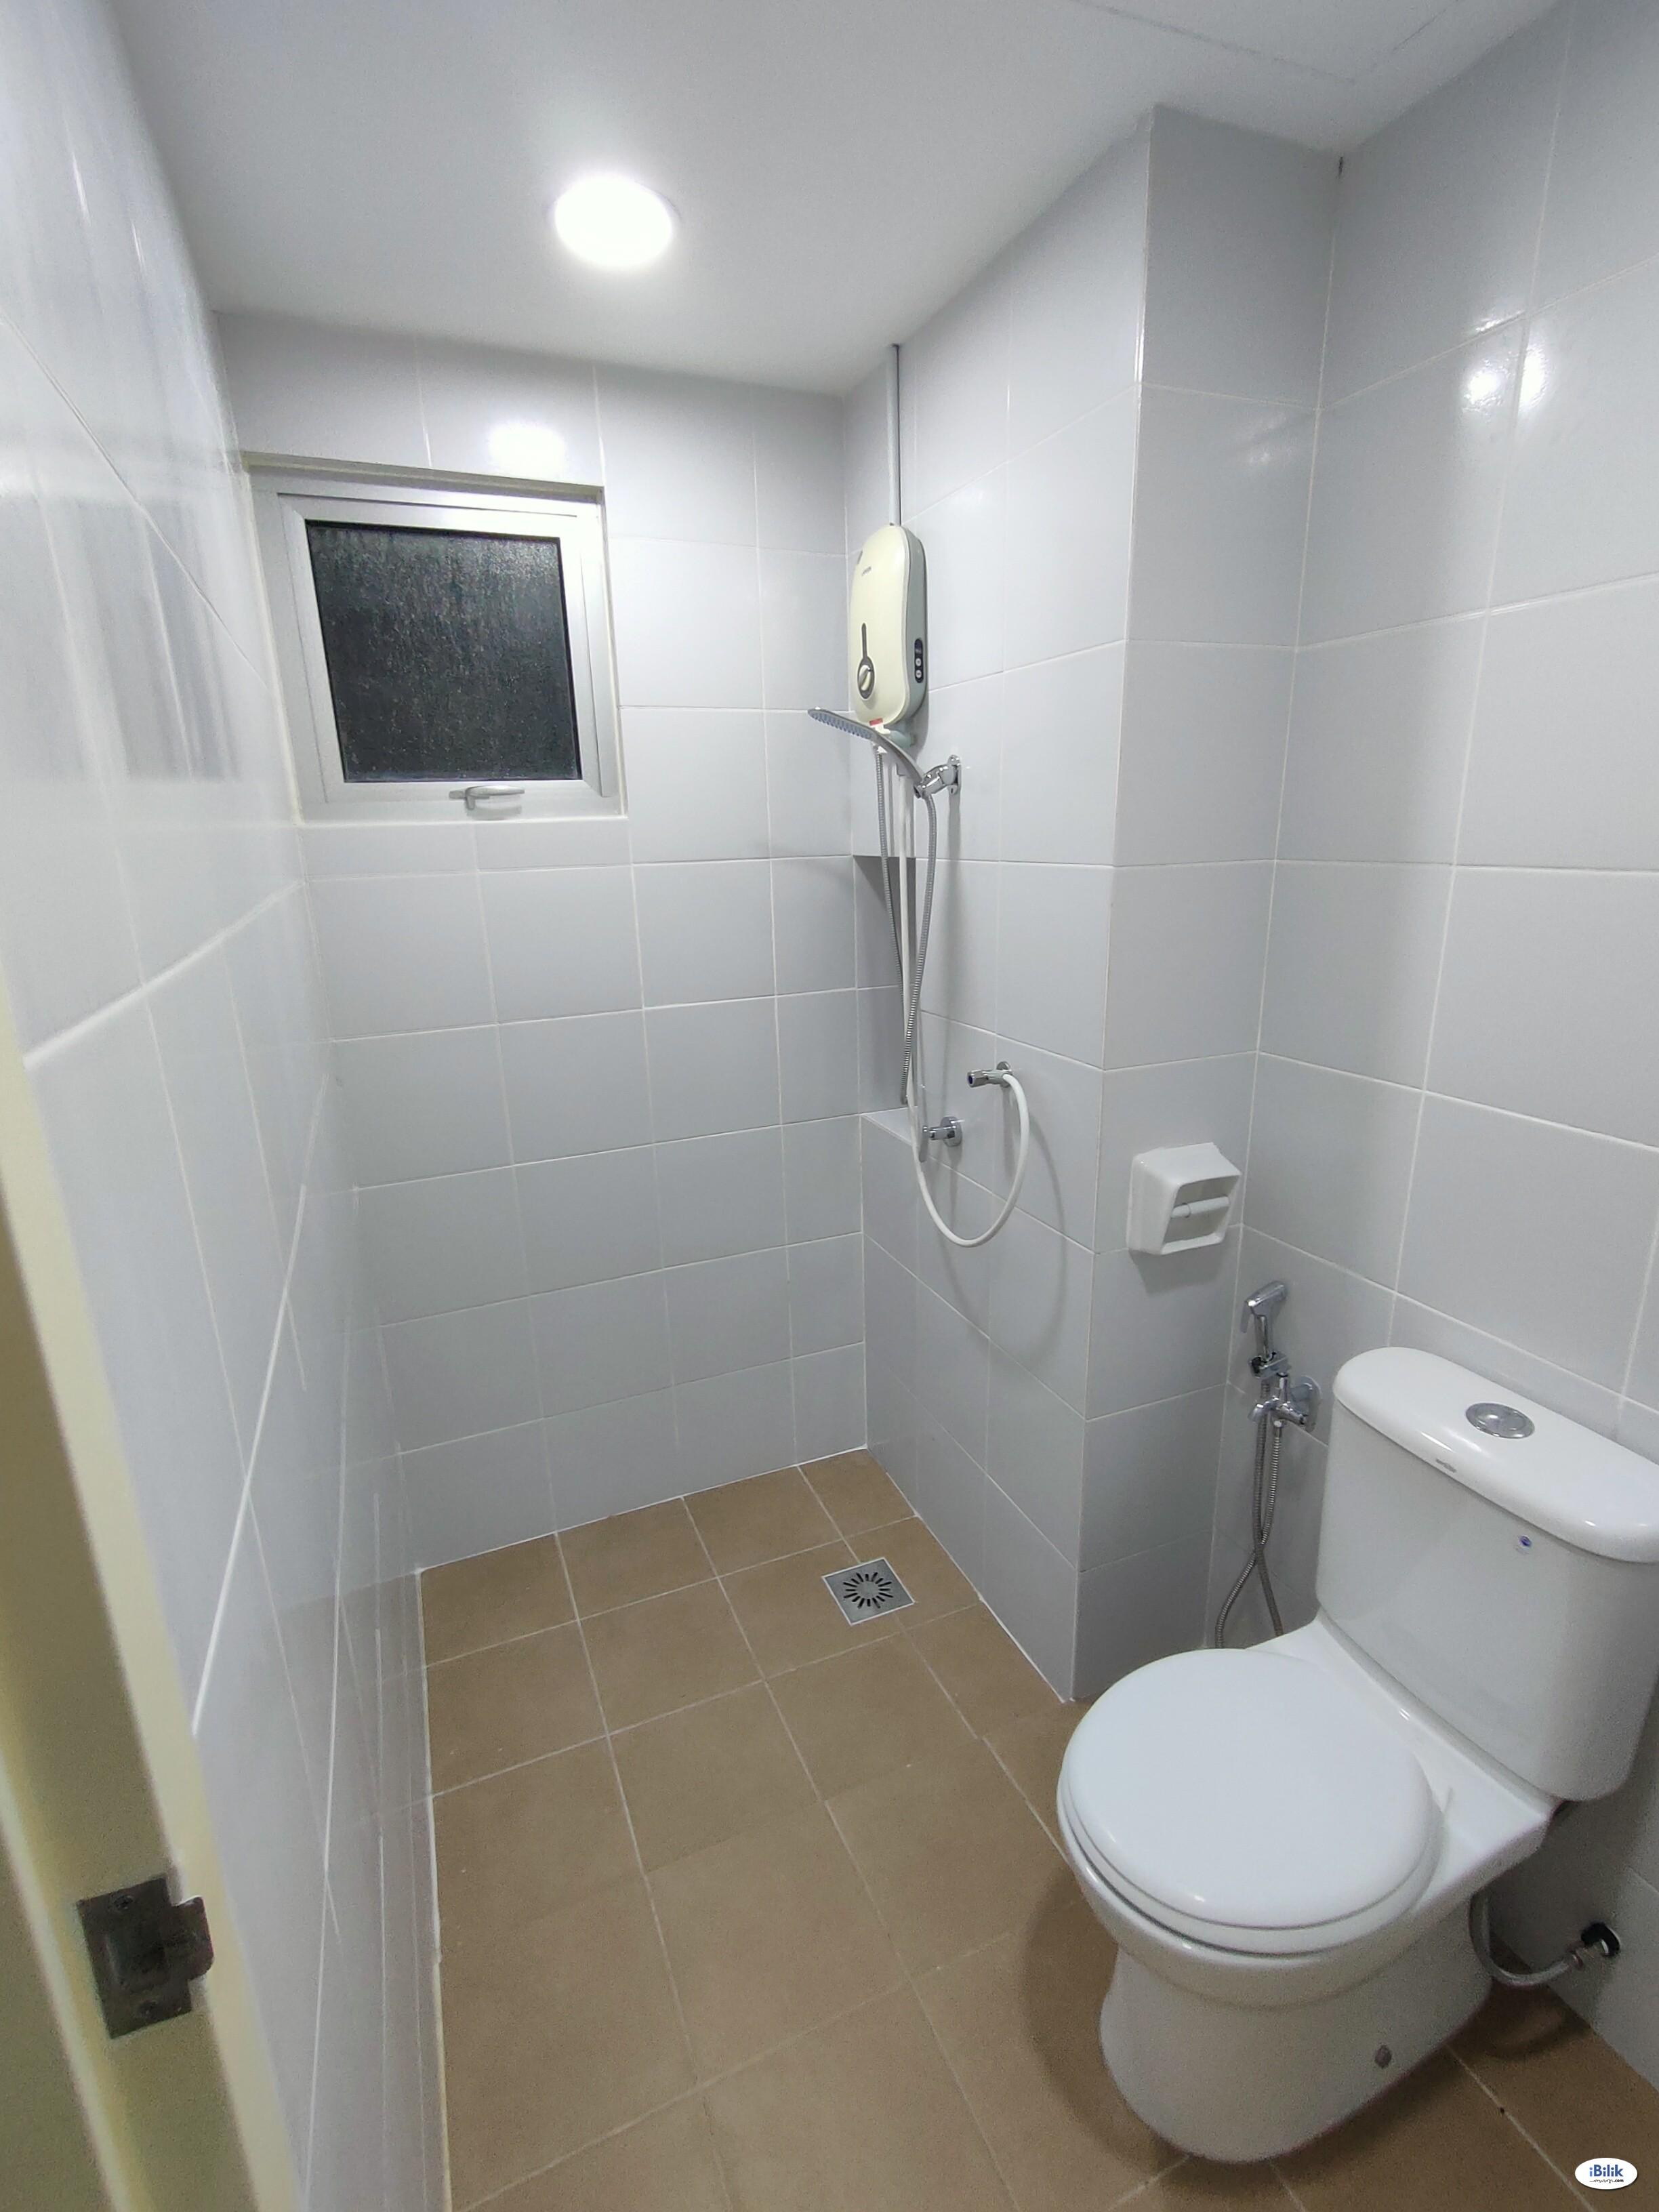 D'Nuri EXSIM @ Desa Petaling - Master Room with Bathroom